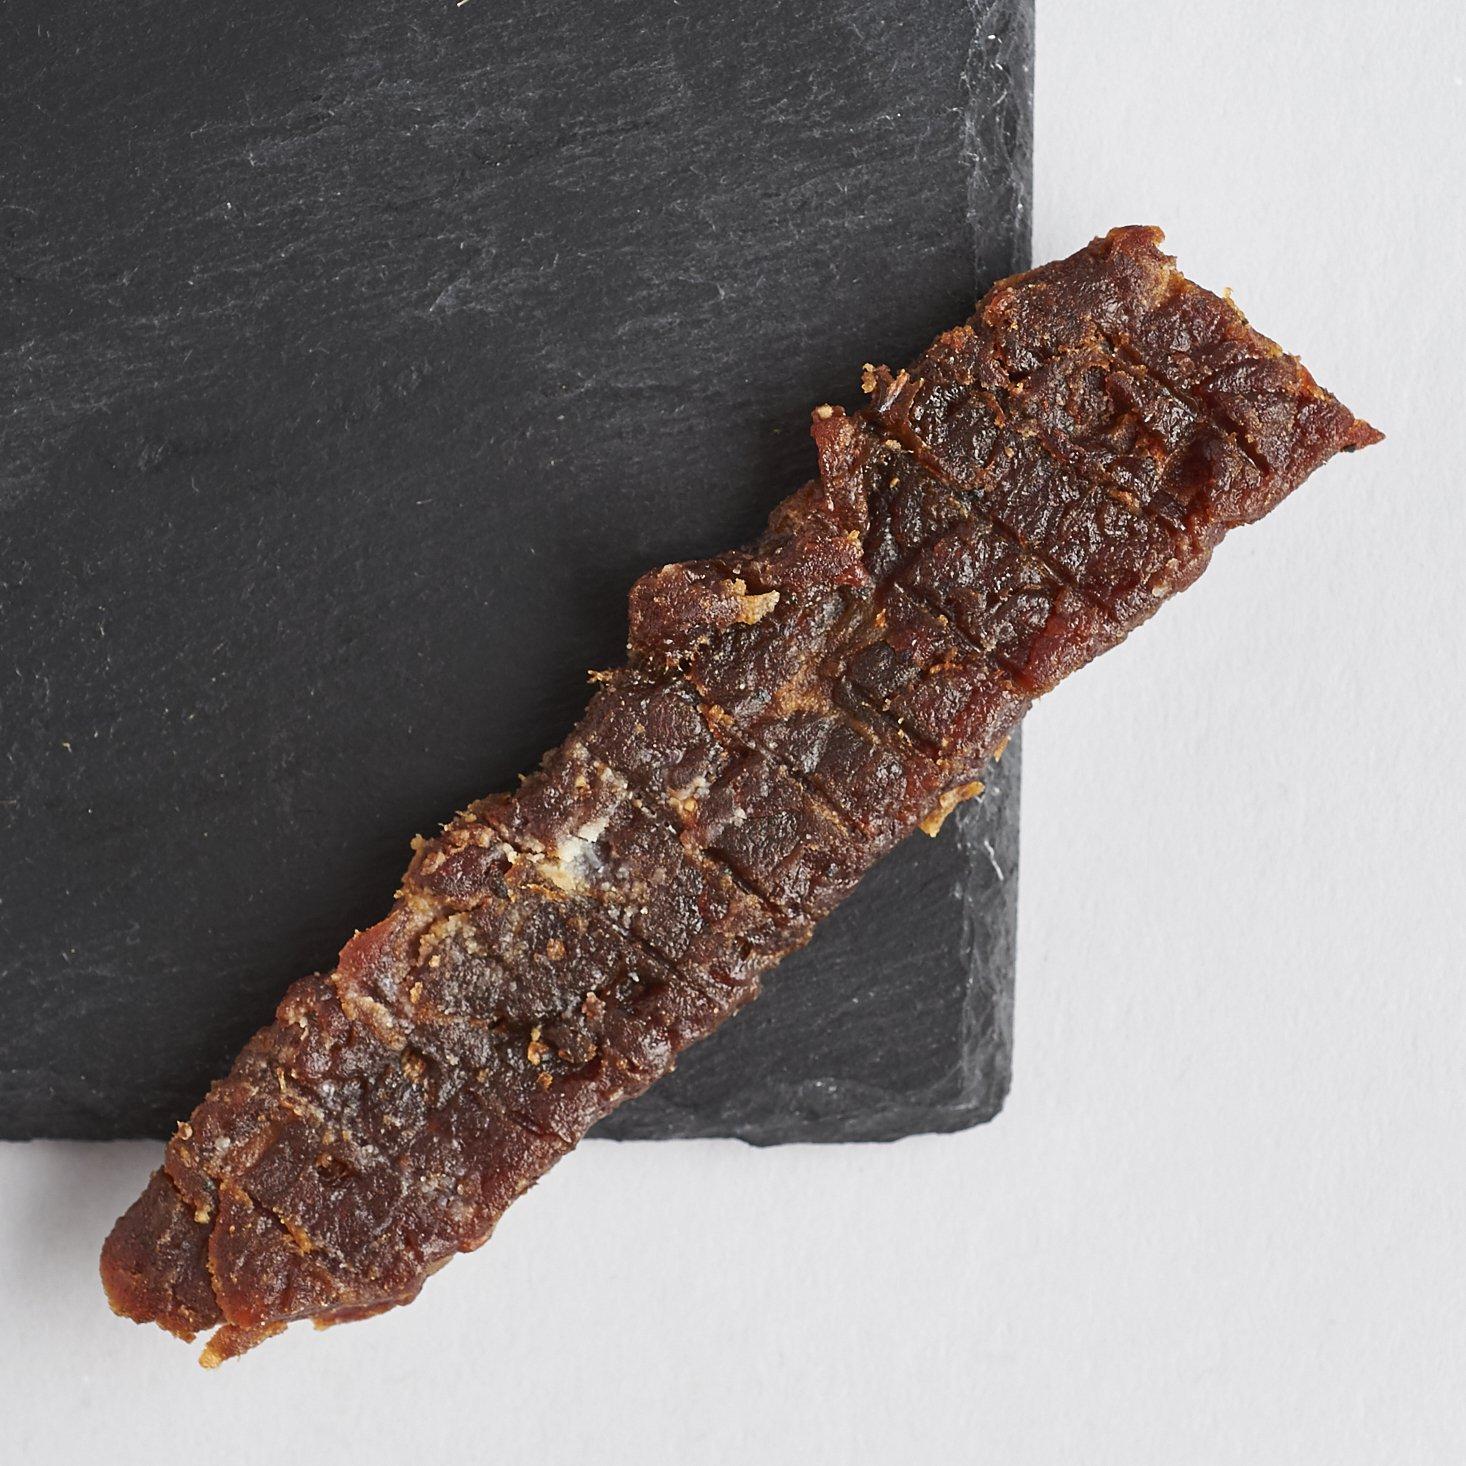 People's Choice Beef Jerky - Tasting Kitchen - Orange Honey Teriyaki - Gourmet Handmade Craft Meat Snack - 1 Pound Bag by People's Choice Beef Jerky (Image #2)